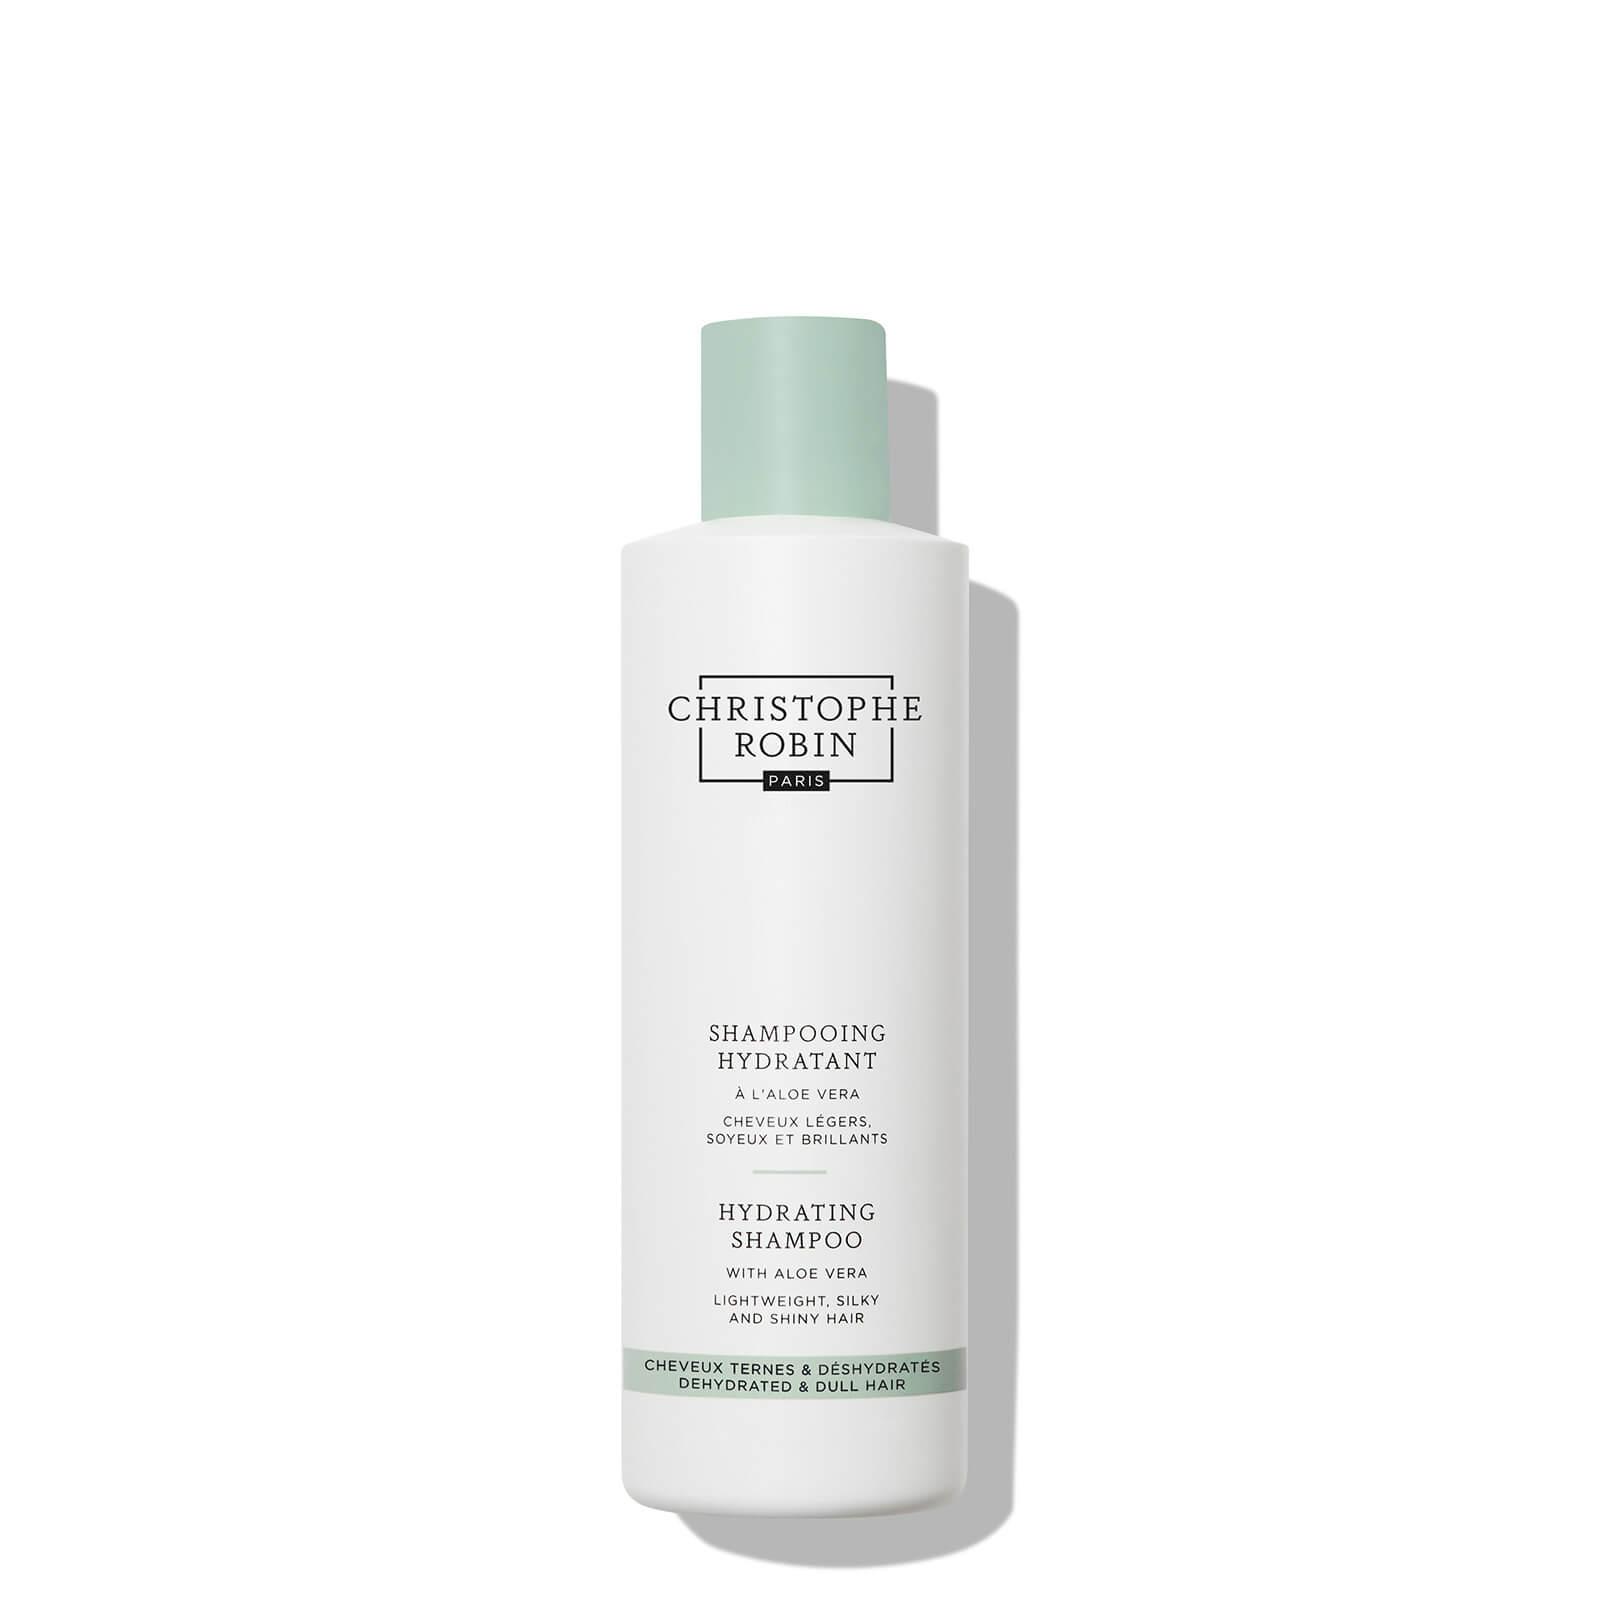 Купить Christophe Robin Hydrating Shampoo with Aloe Vera 250ml